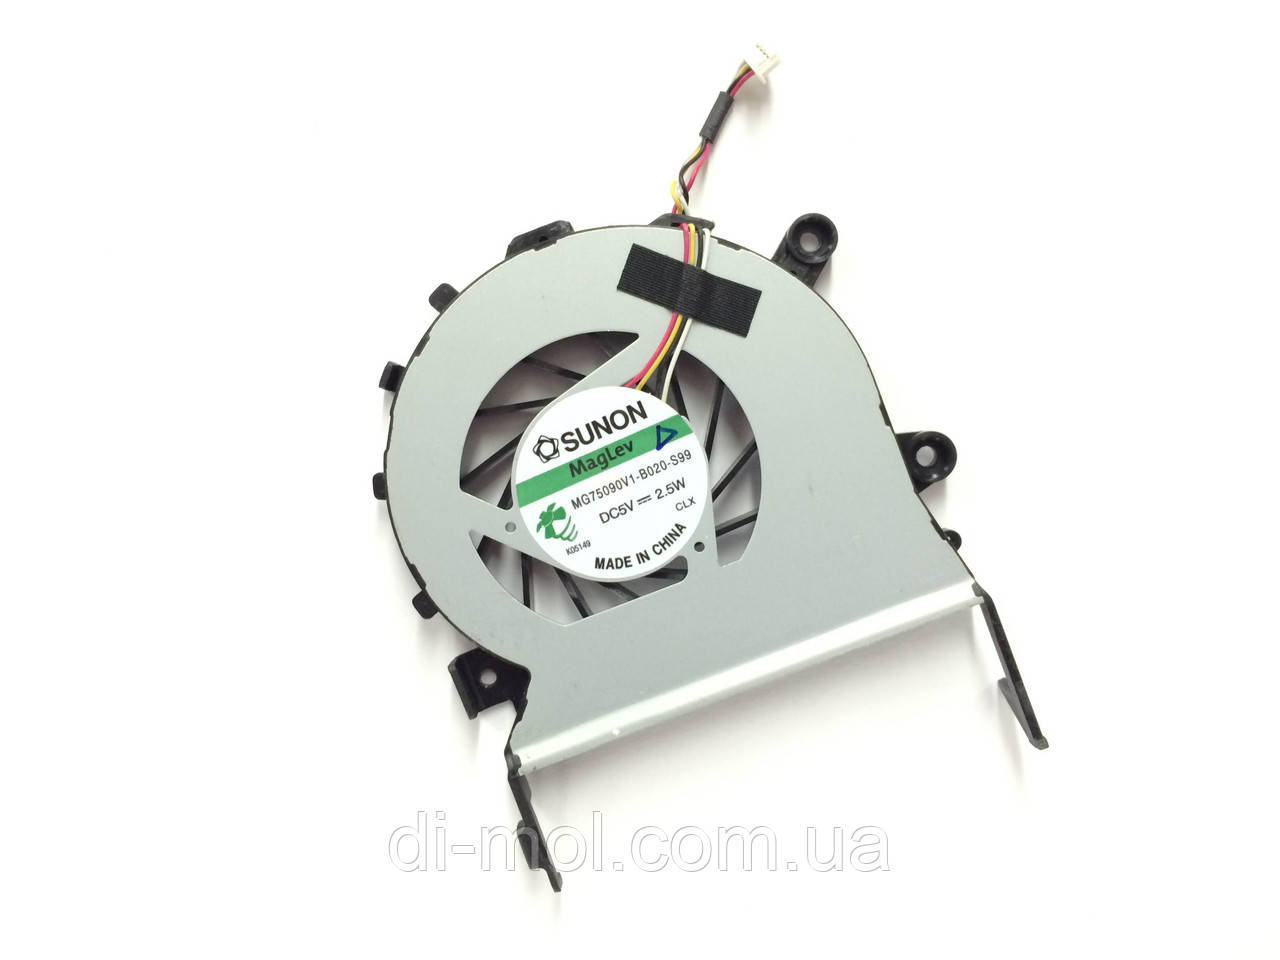 Вентилятор для ноутбука Acer Aspire 5625, 5553G, 5553NWXMi, 5553WXMi series, 4-pin